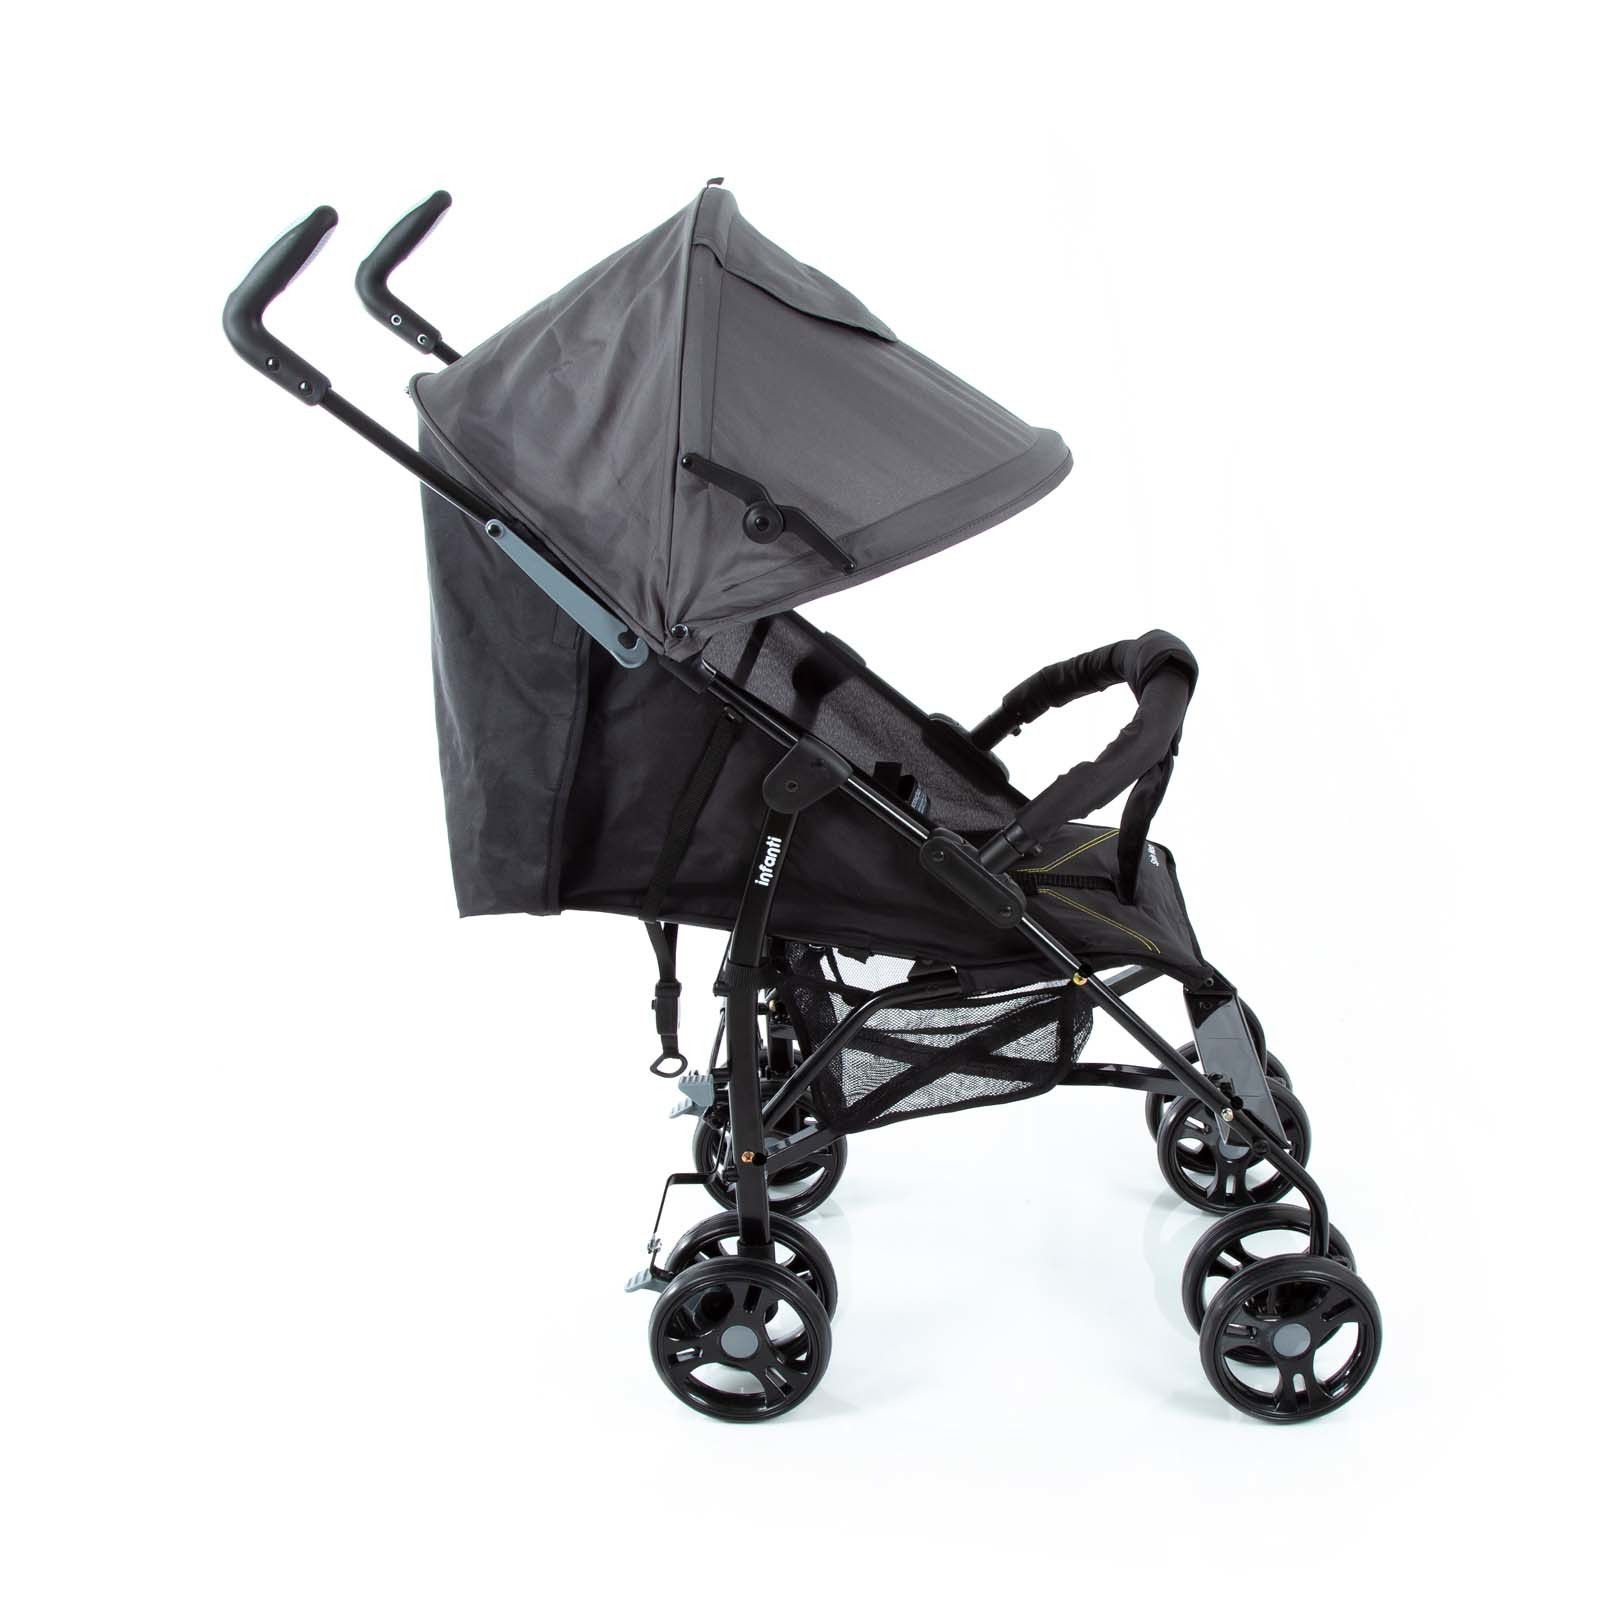 Carrinho Umbrella Spin Neo Infanti Grey City - Infanti IMP01683